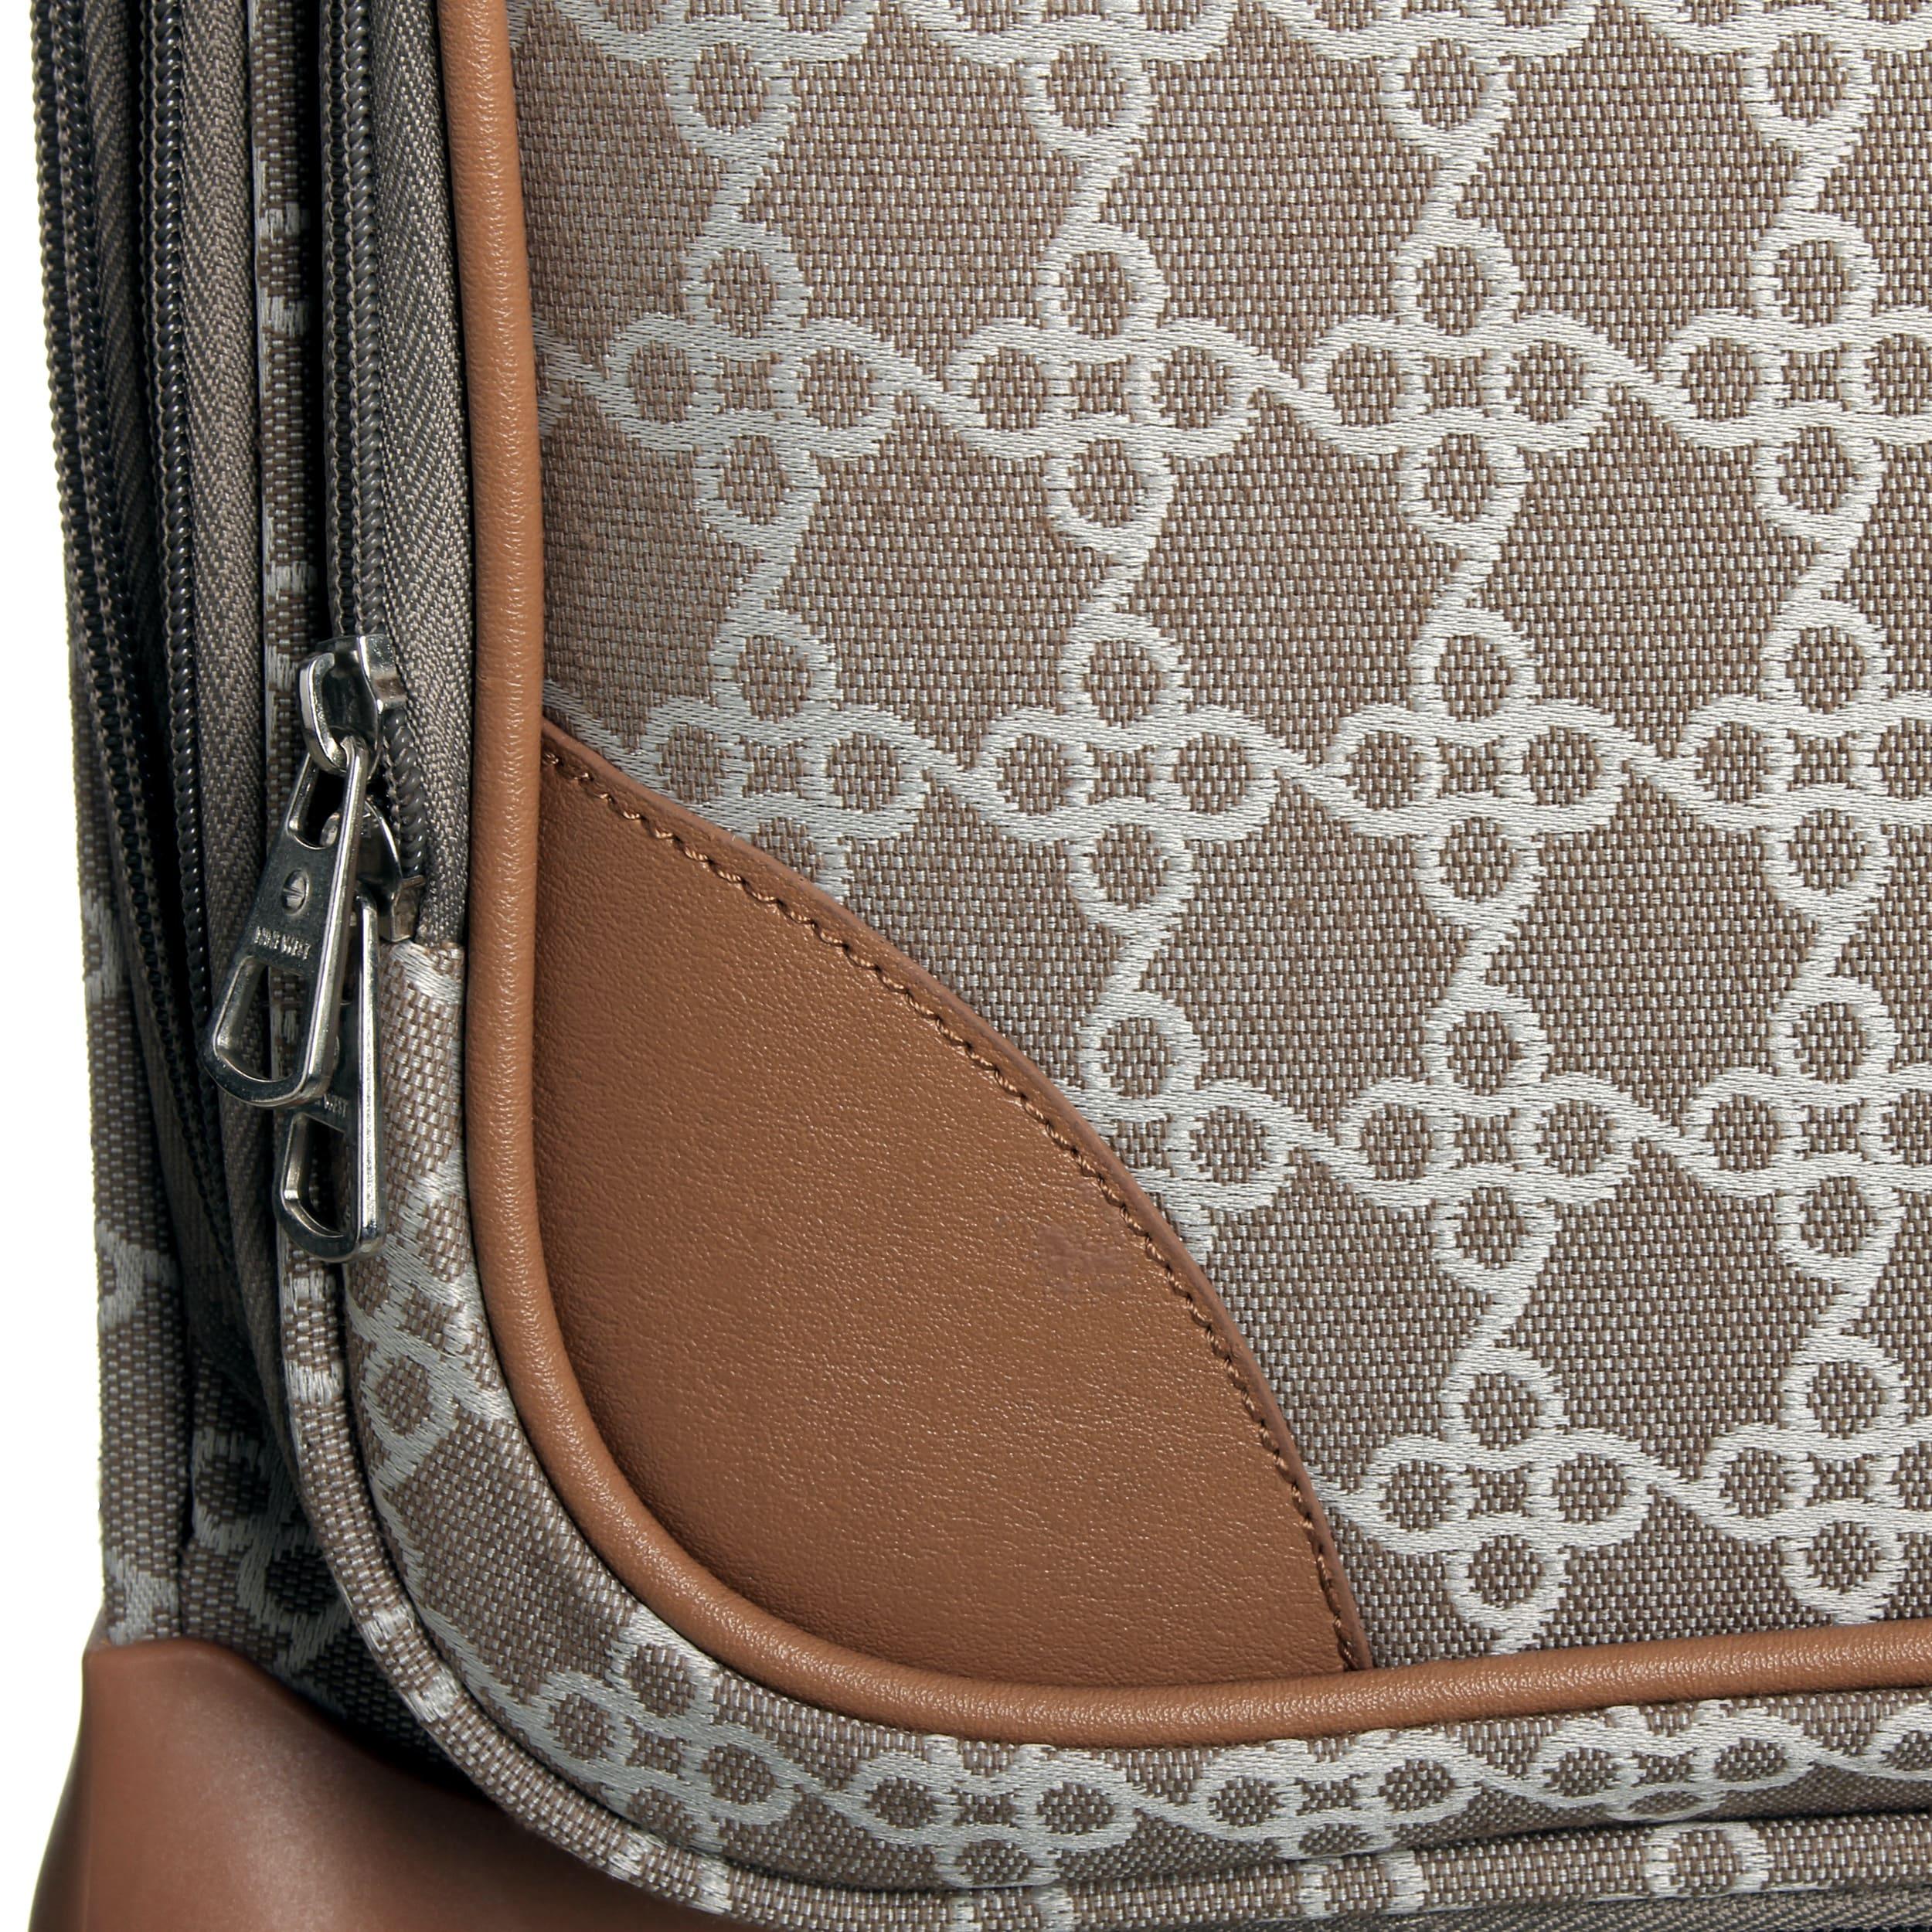 da18b956d Shop Nine West Addison 4-piece Fashion Luggage Set - Free Shipping Today -  Overstock - 9350075